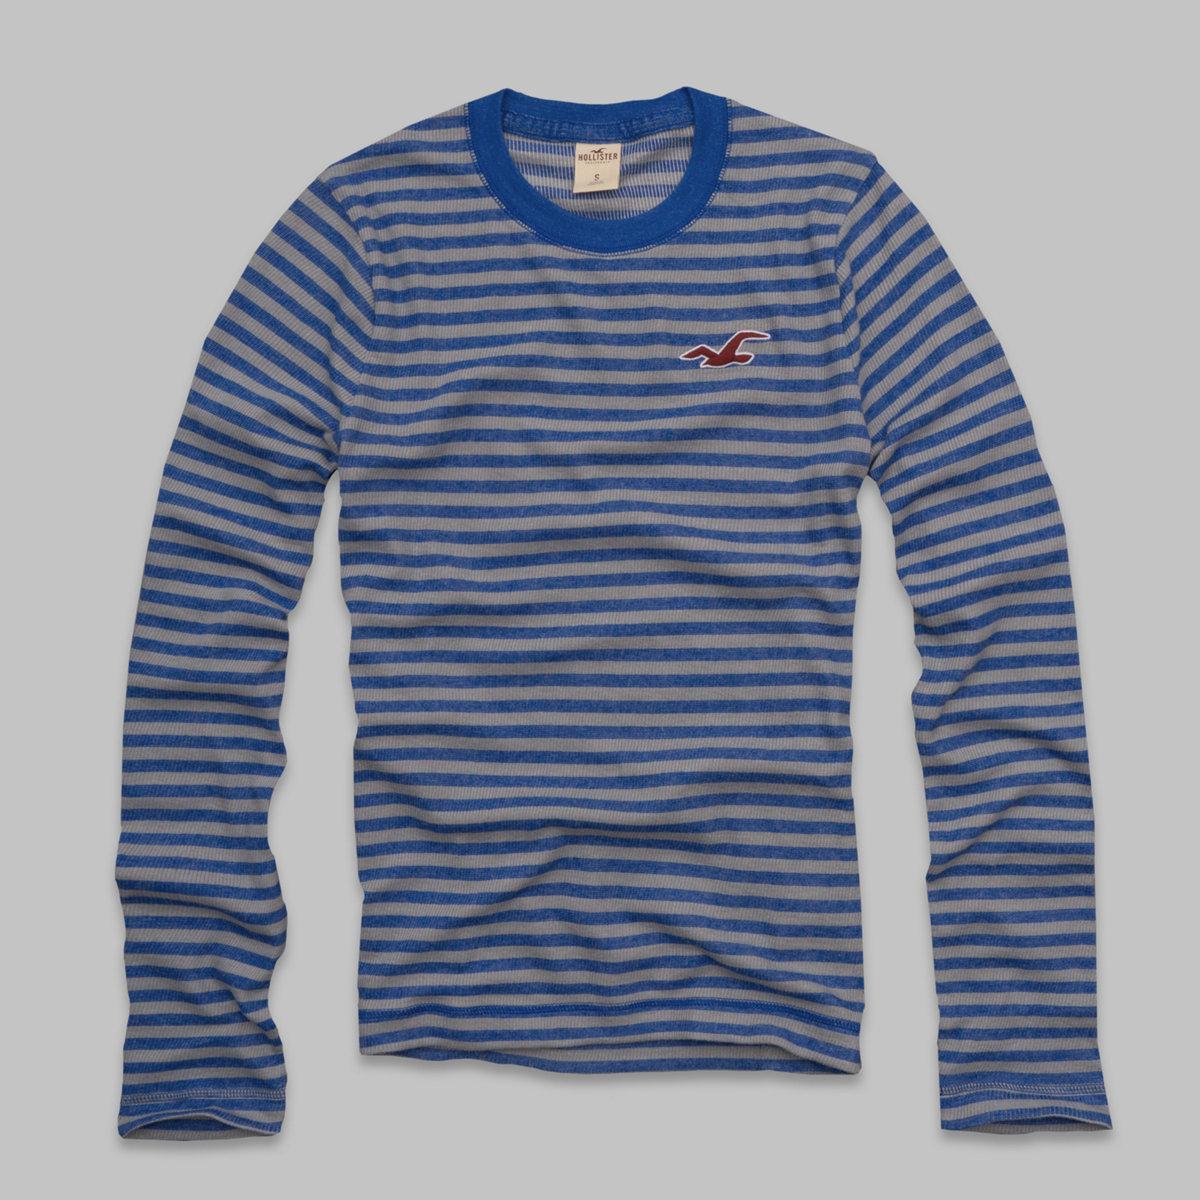 Crescent Bay T-Shirt